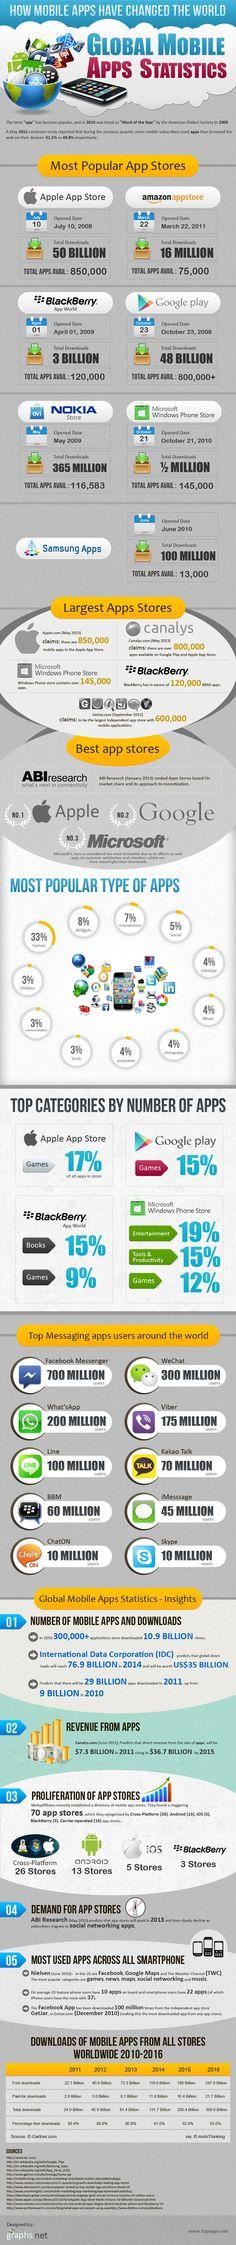 Mobile Apps Global Statistics